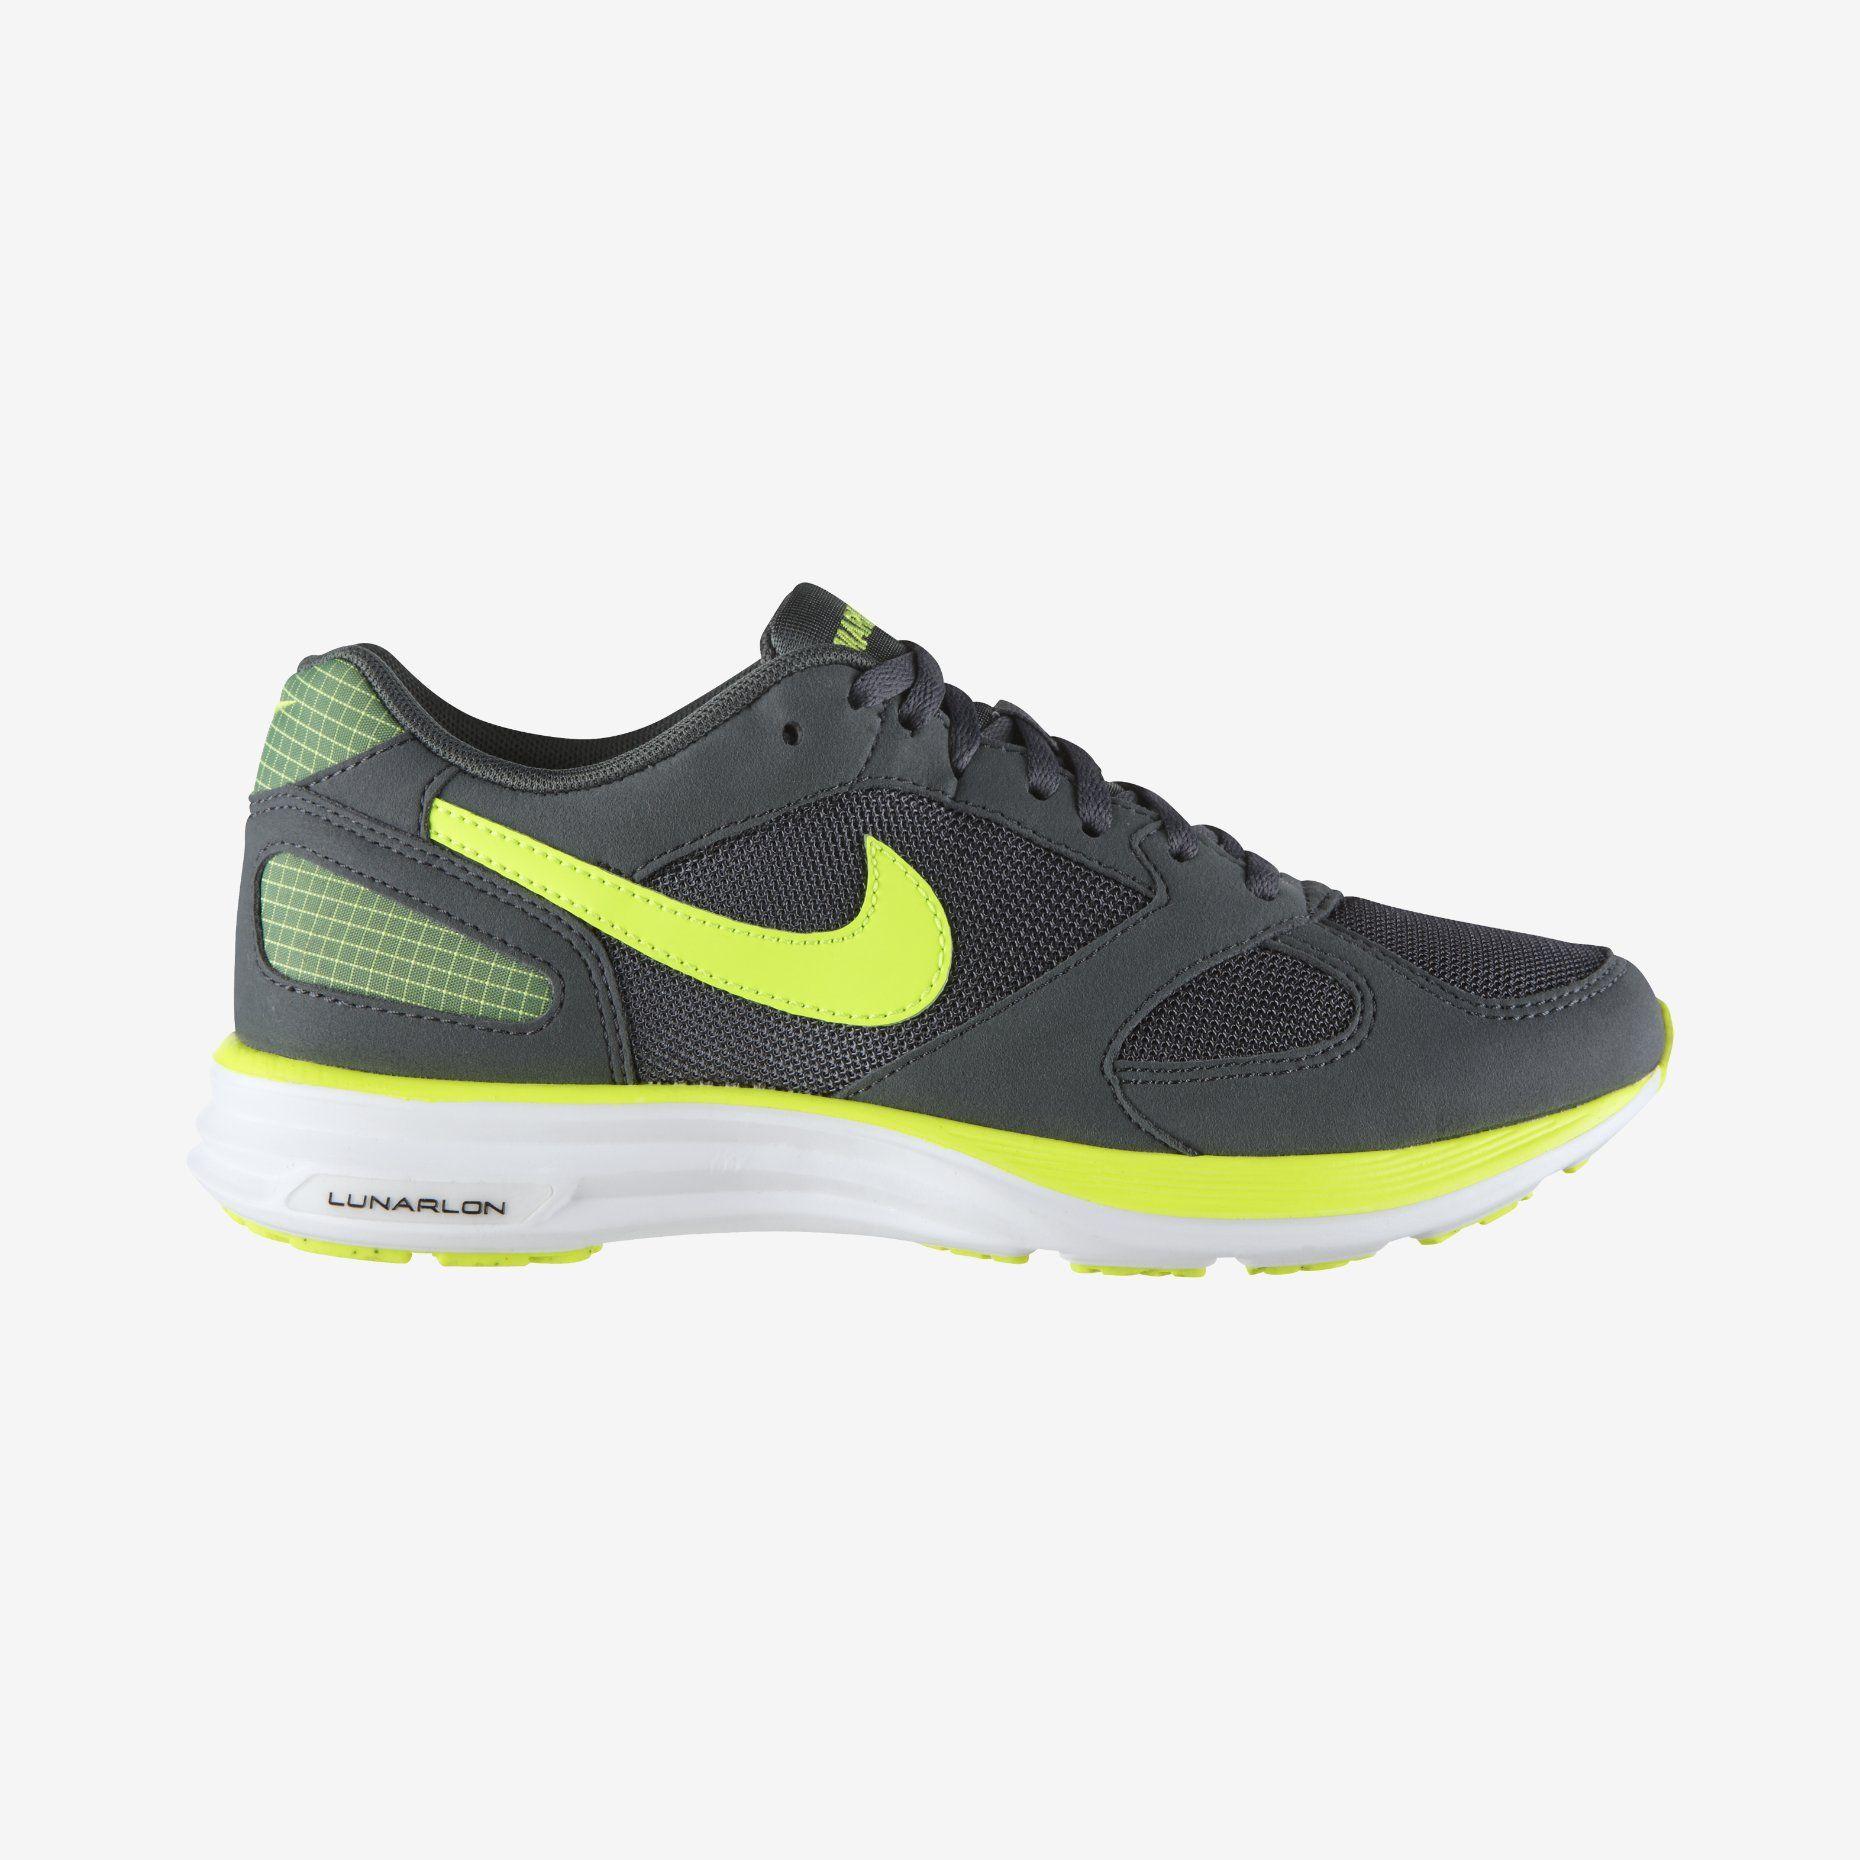 Lunarspeed Lunarspeed Nike Nike Mariah Nike Nike Lunarspeed Mariah Lunarspeed Mariah Nike Lunarspeed Mariah tBxqTqwC